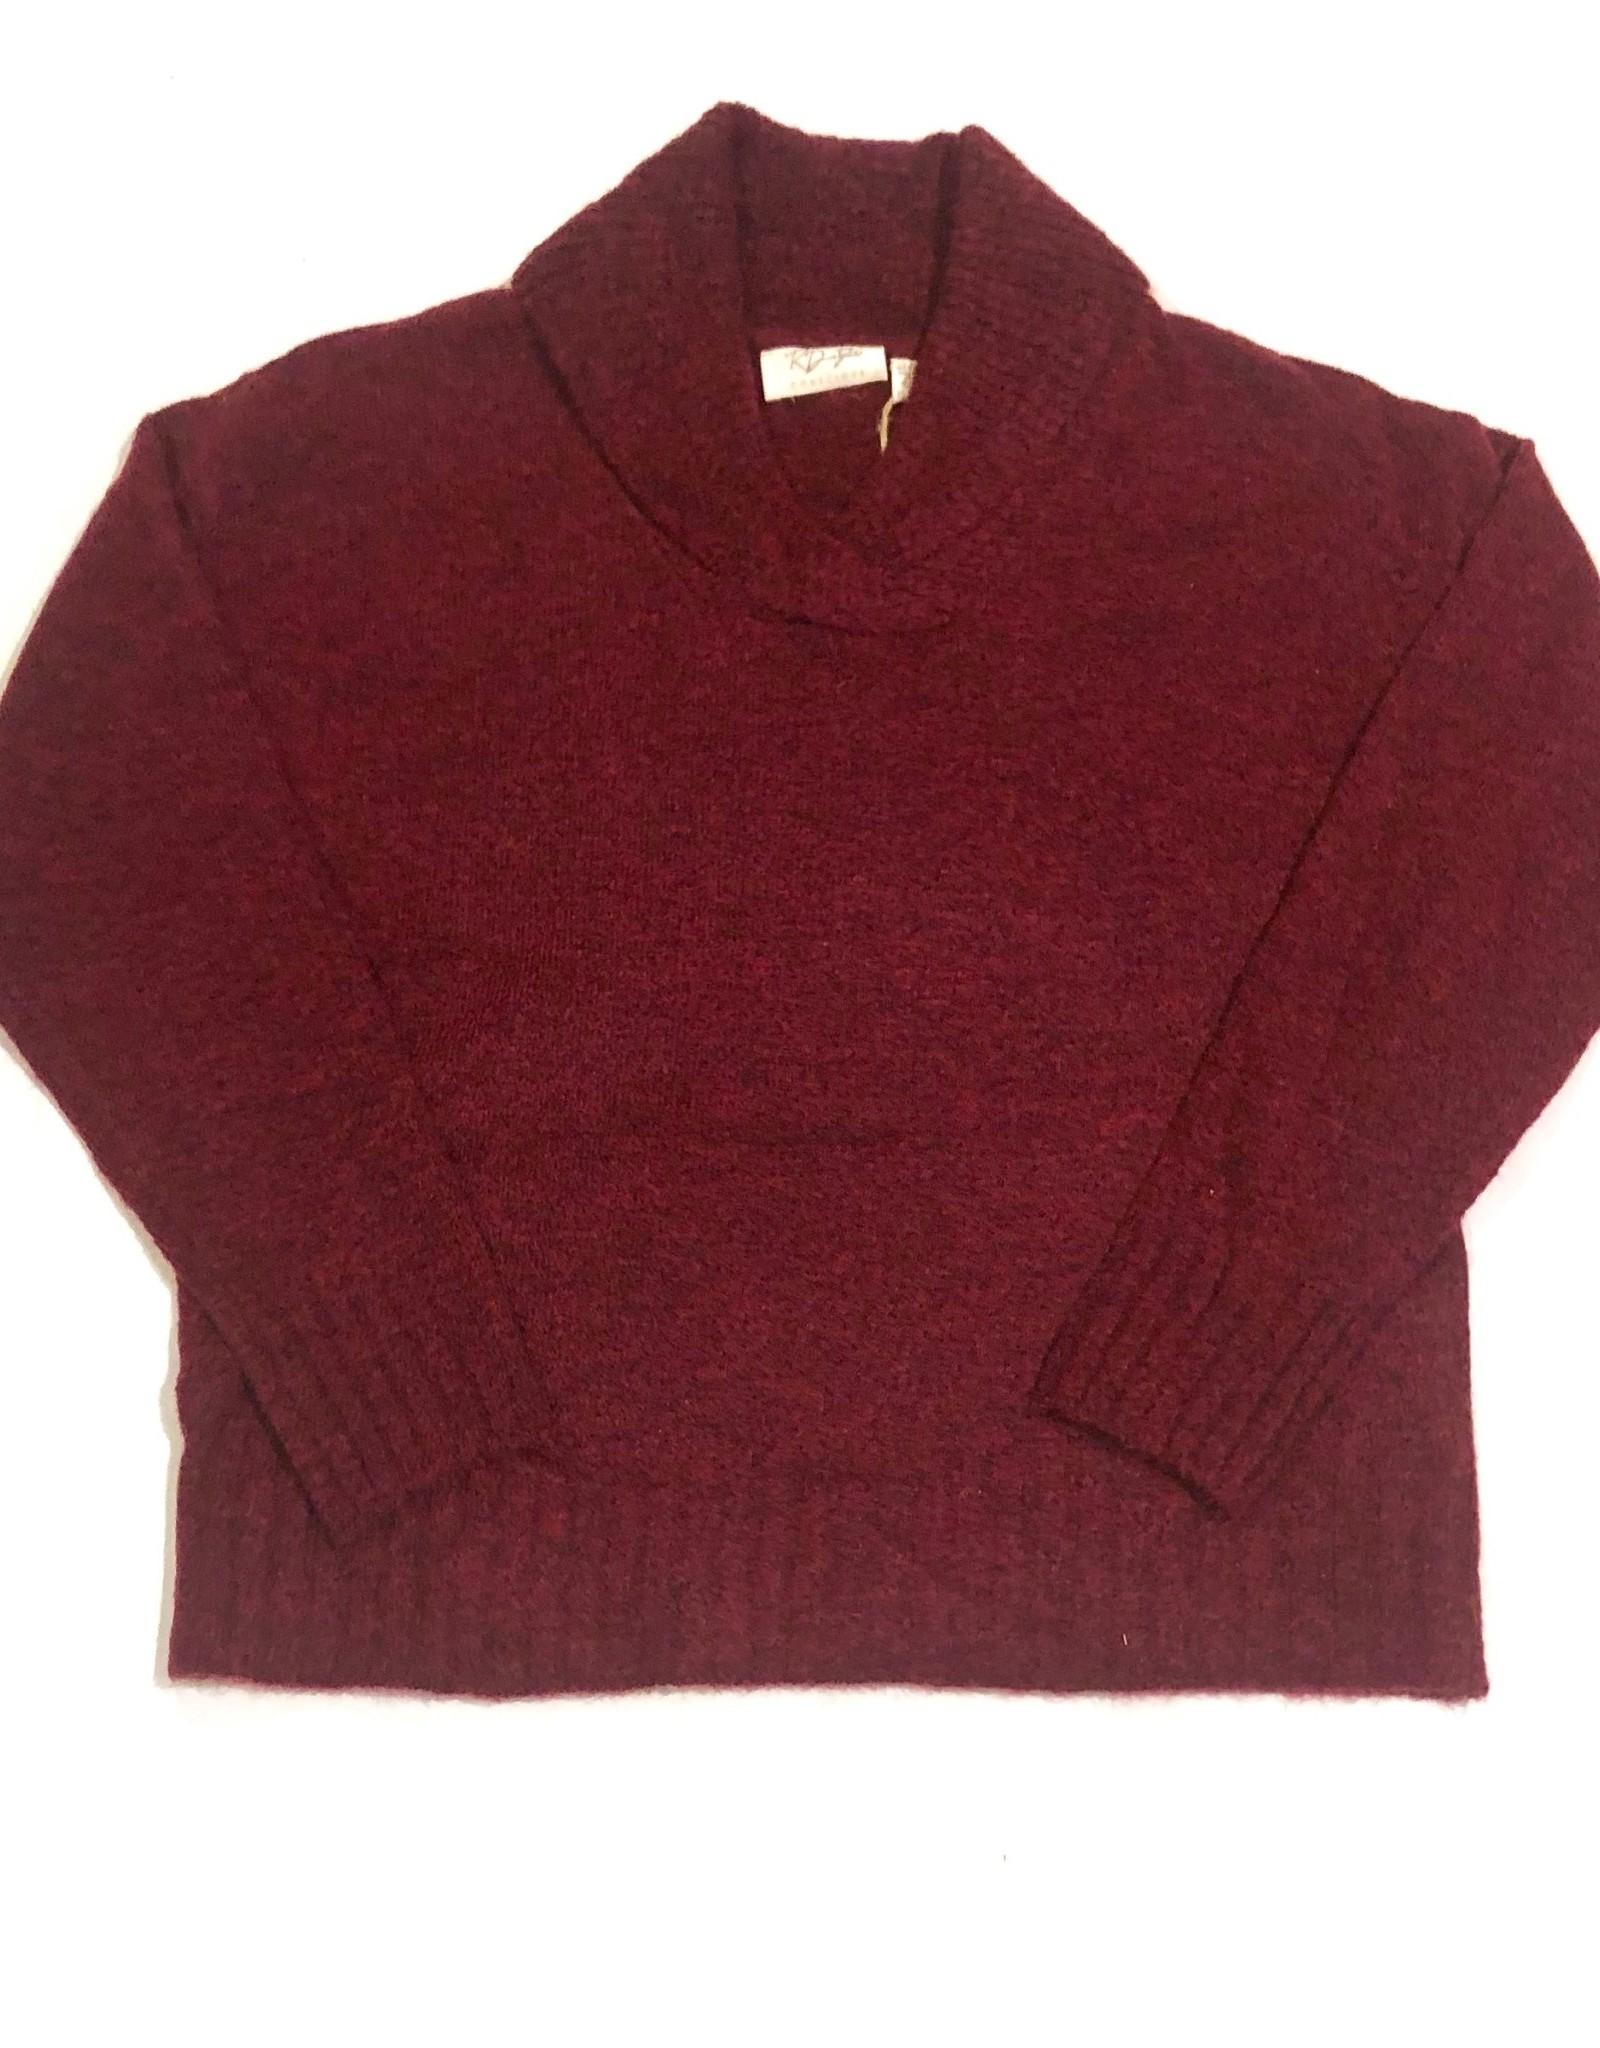 RD cozy turtleneck sweater 73SR384S